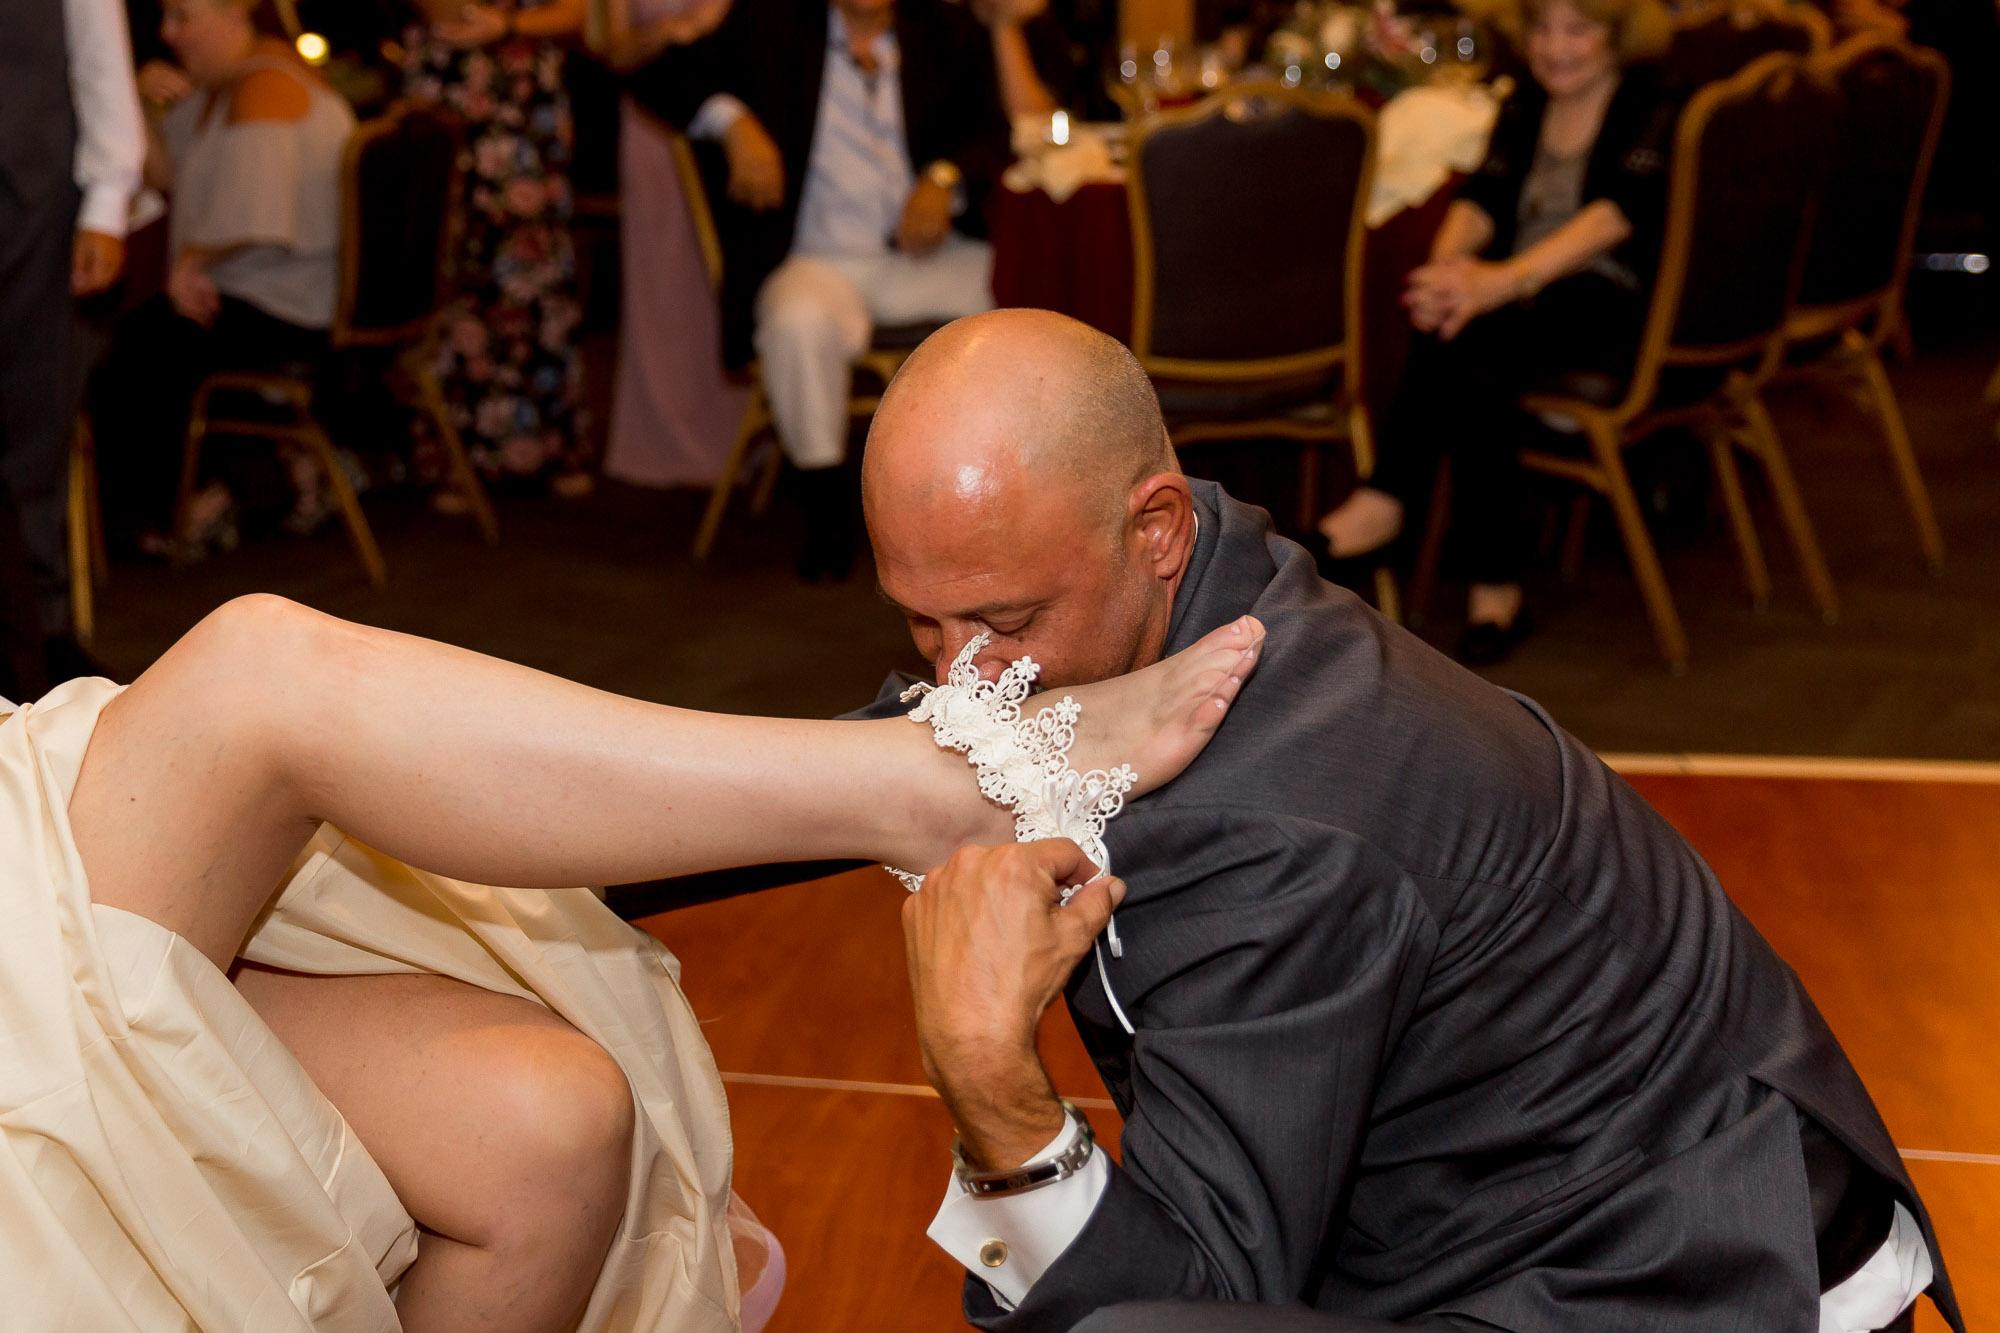 Heather_Pat_San_Marcos_Lakehouse_Wedding_661.jpg